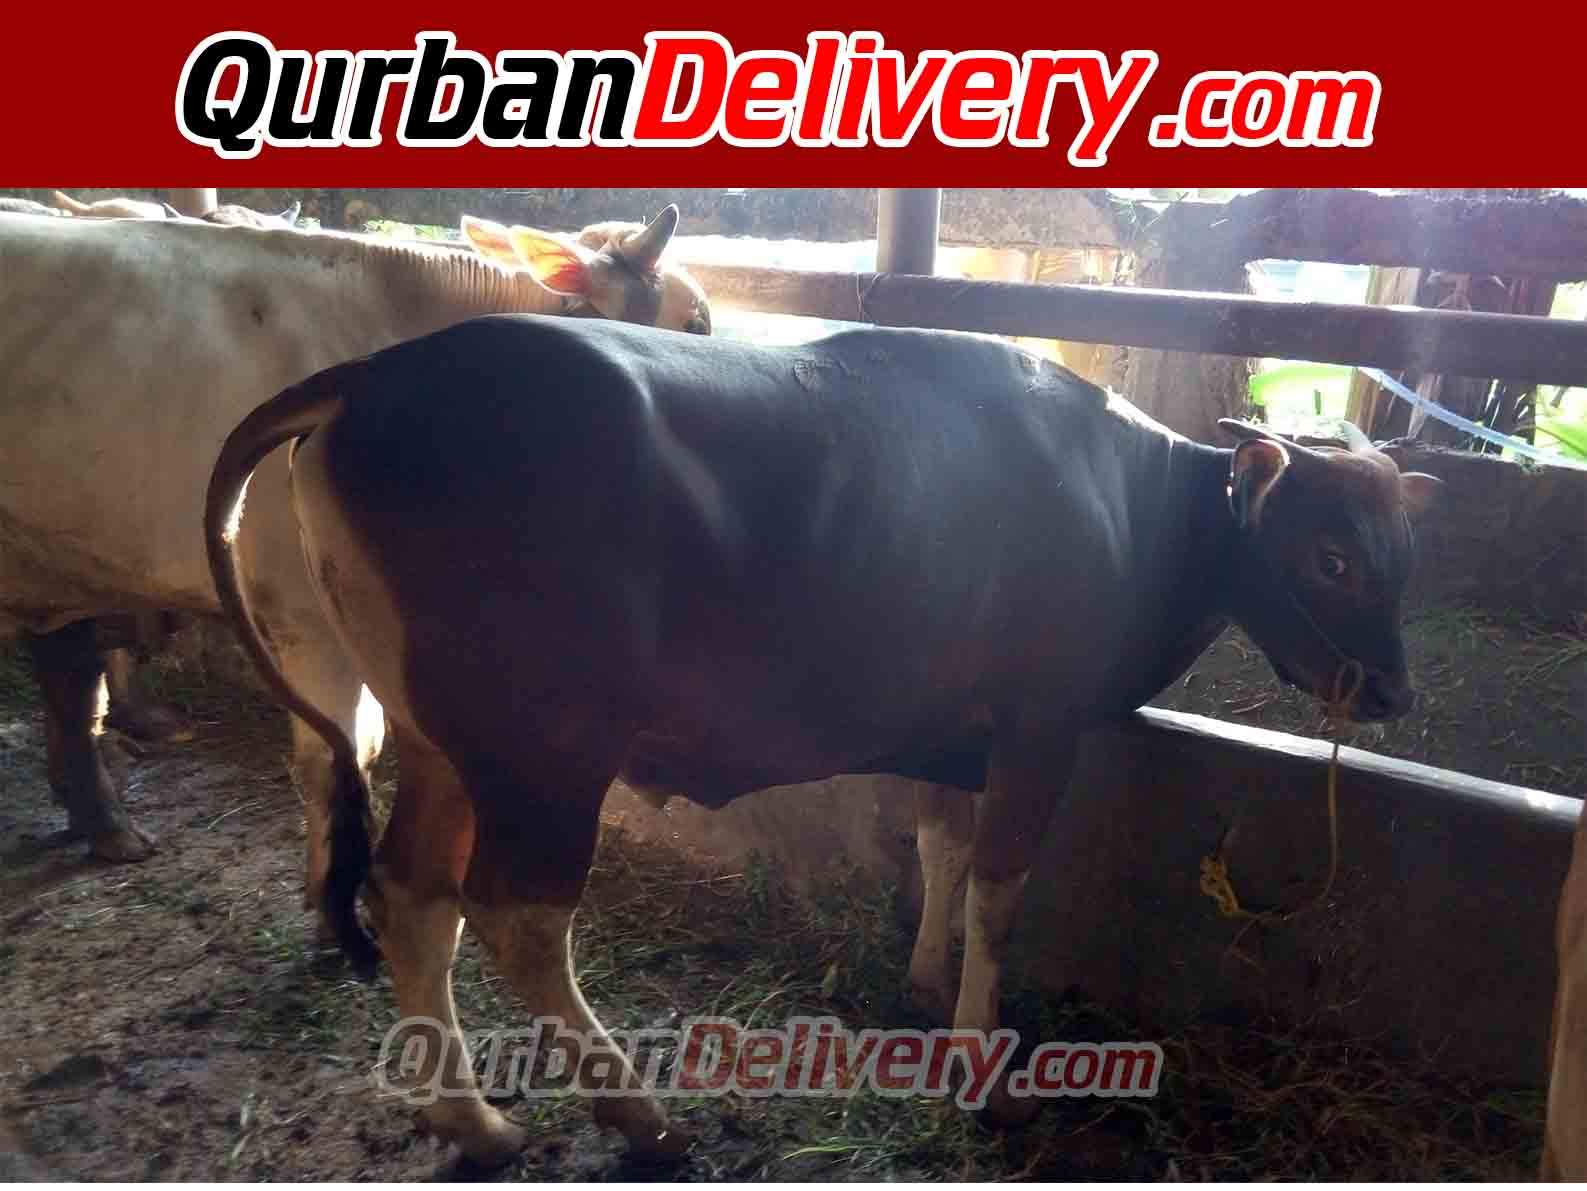 Harga Sapi Bali Qurban Di Bekasi Prediksi 2020-Qurban Delivery